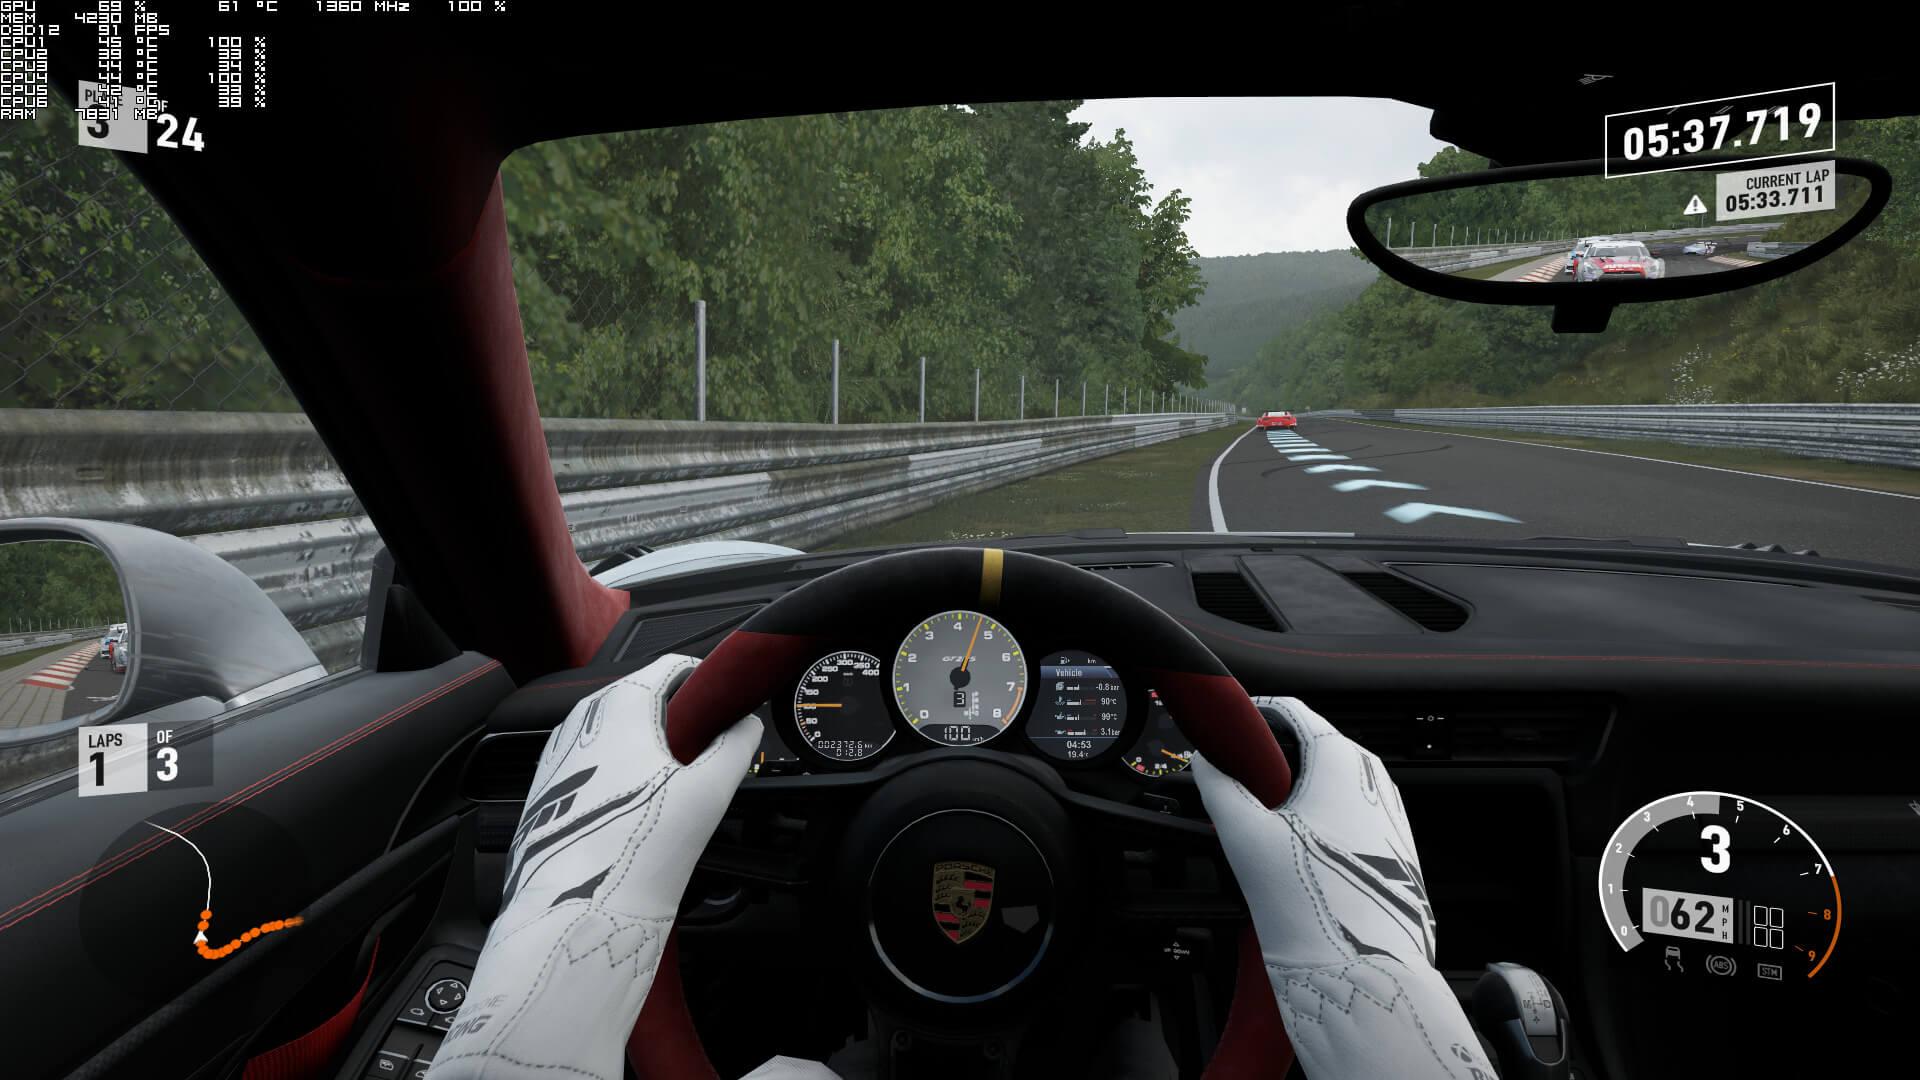 Forza Motorsport 7 Pc Performance Analysis